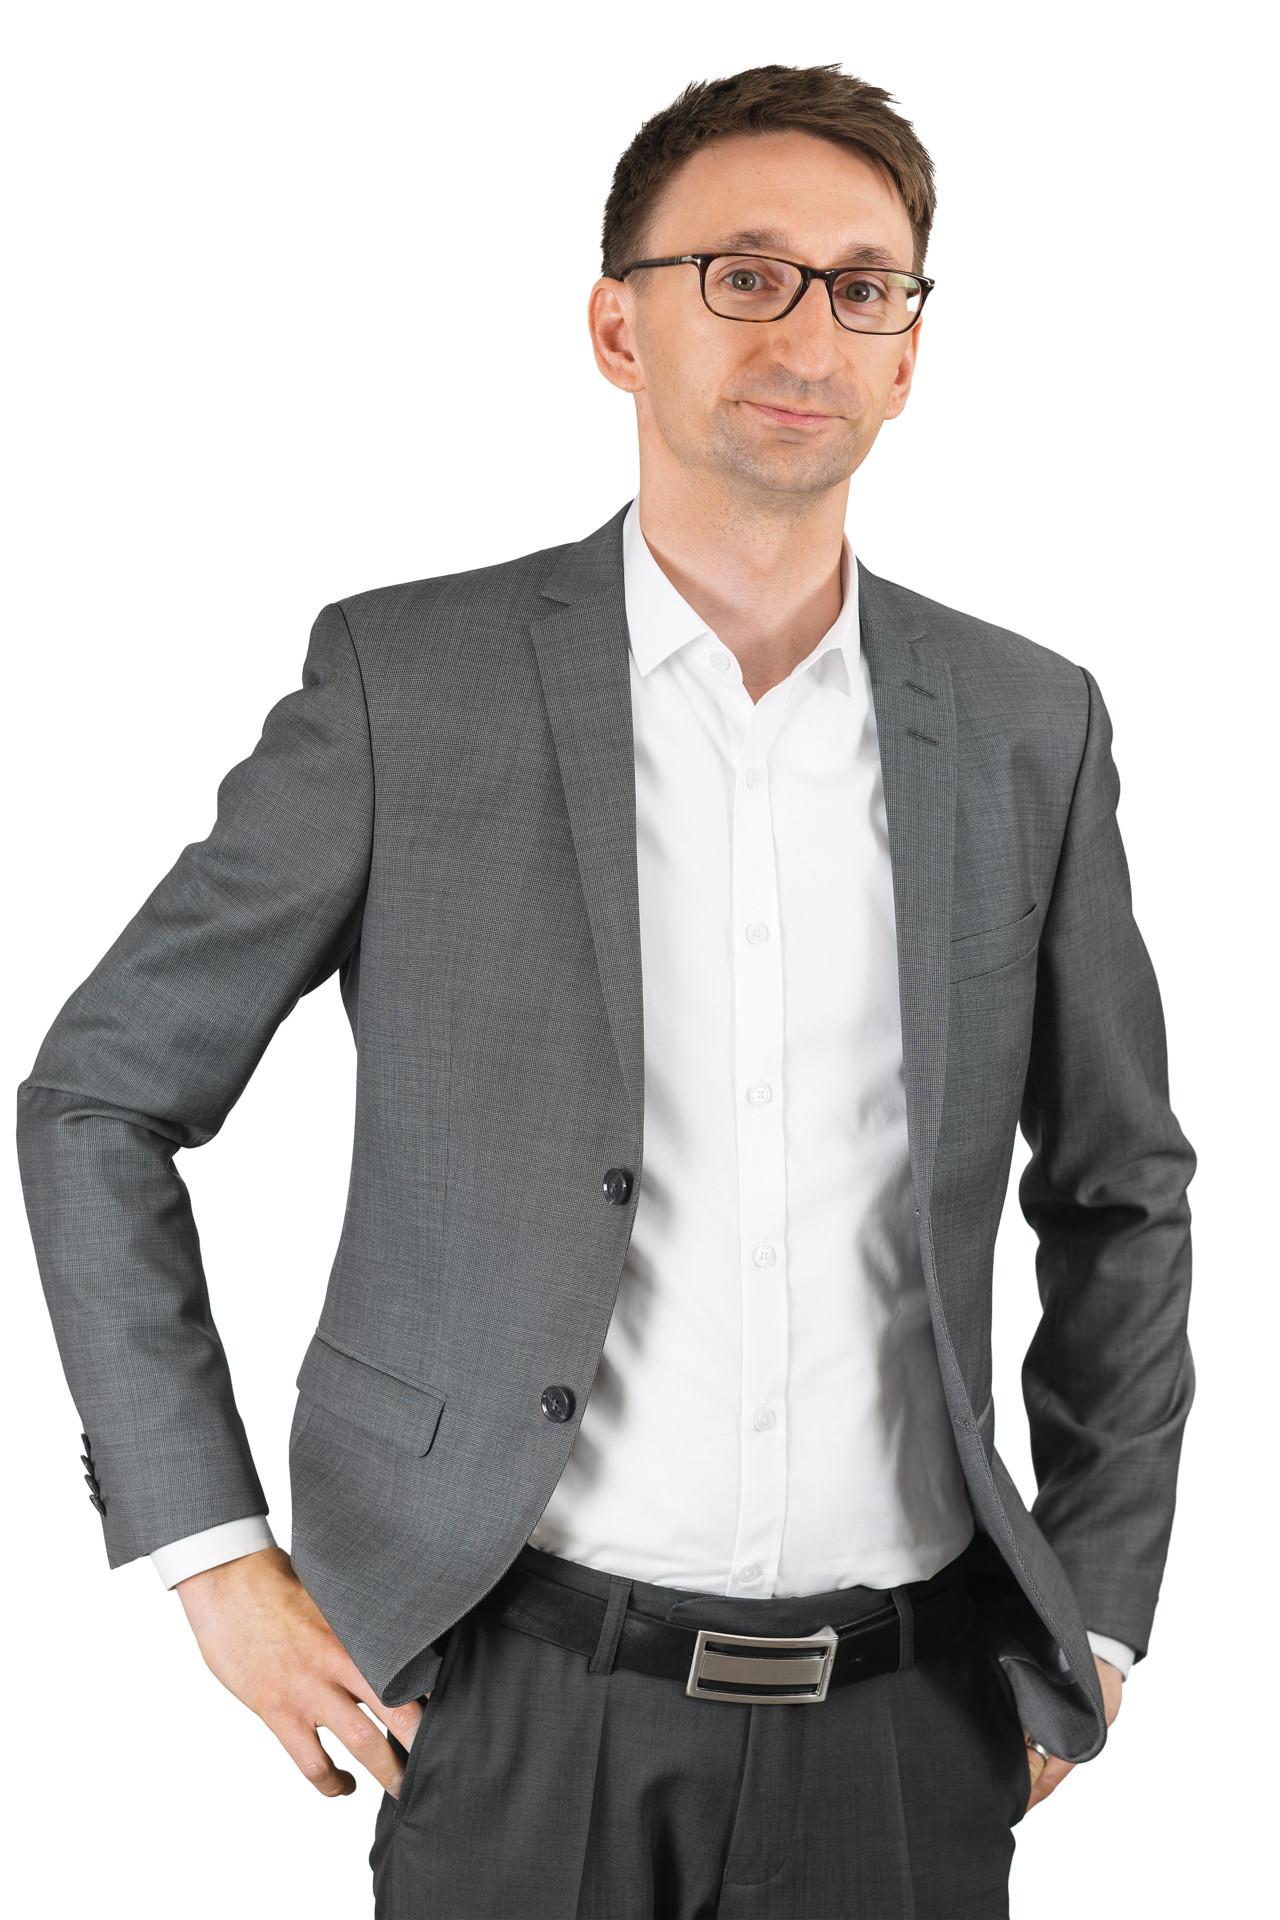 Michel Björn EFFSO managementkonsulter